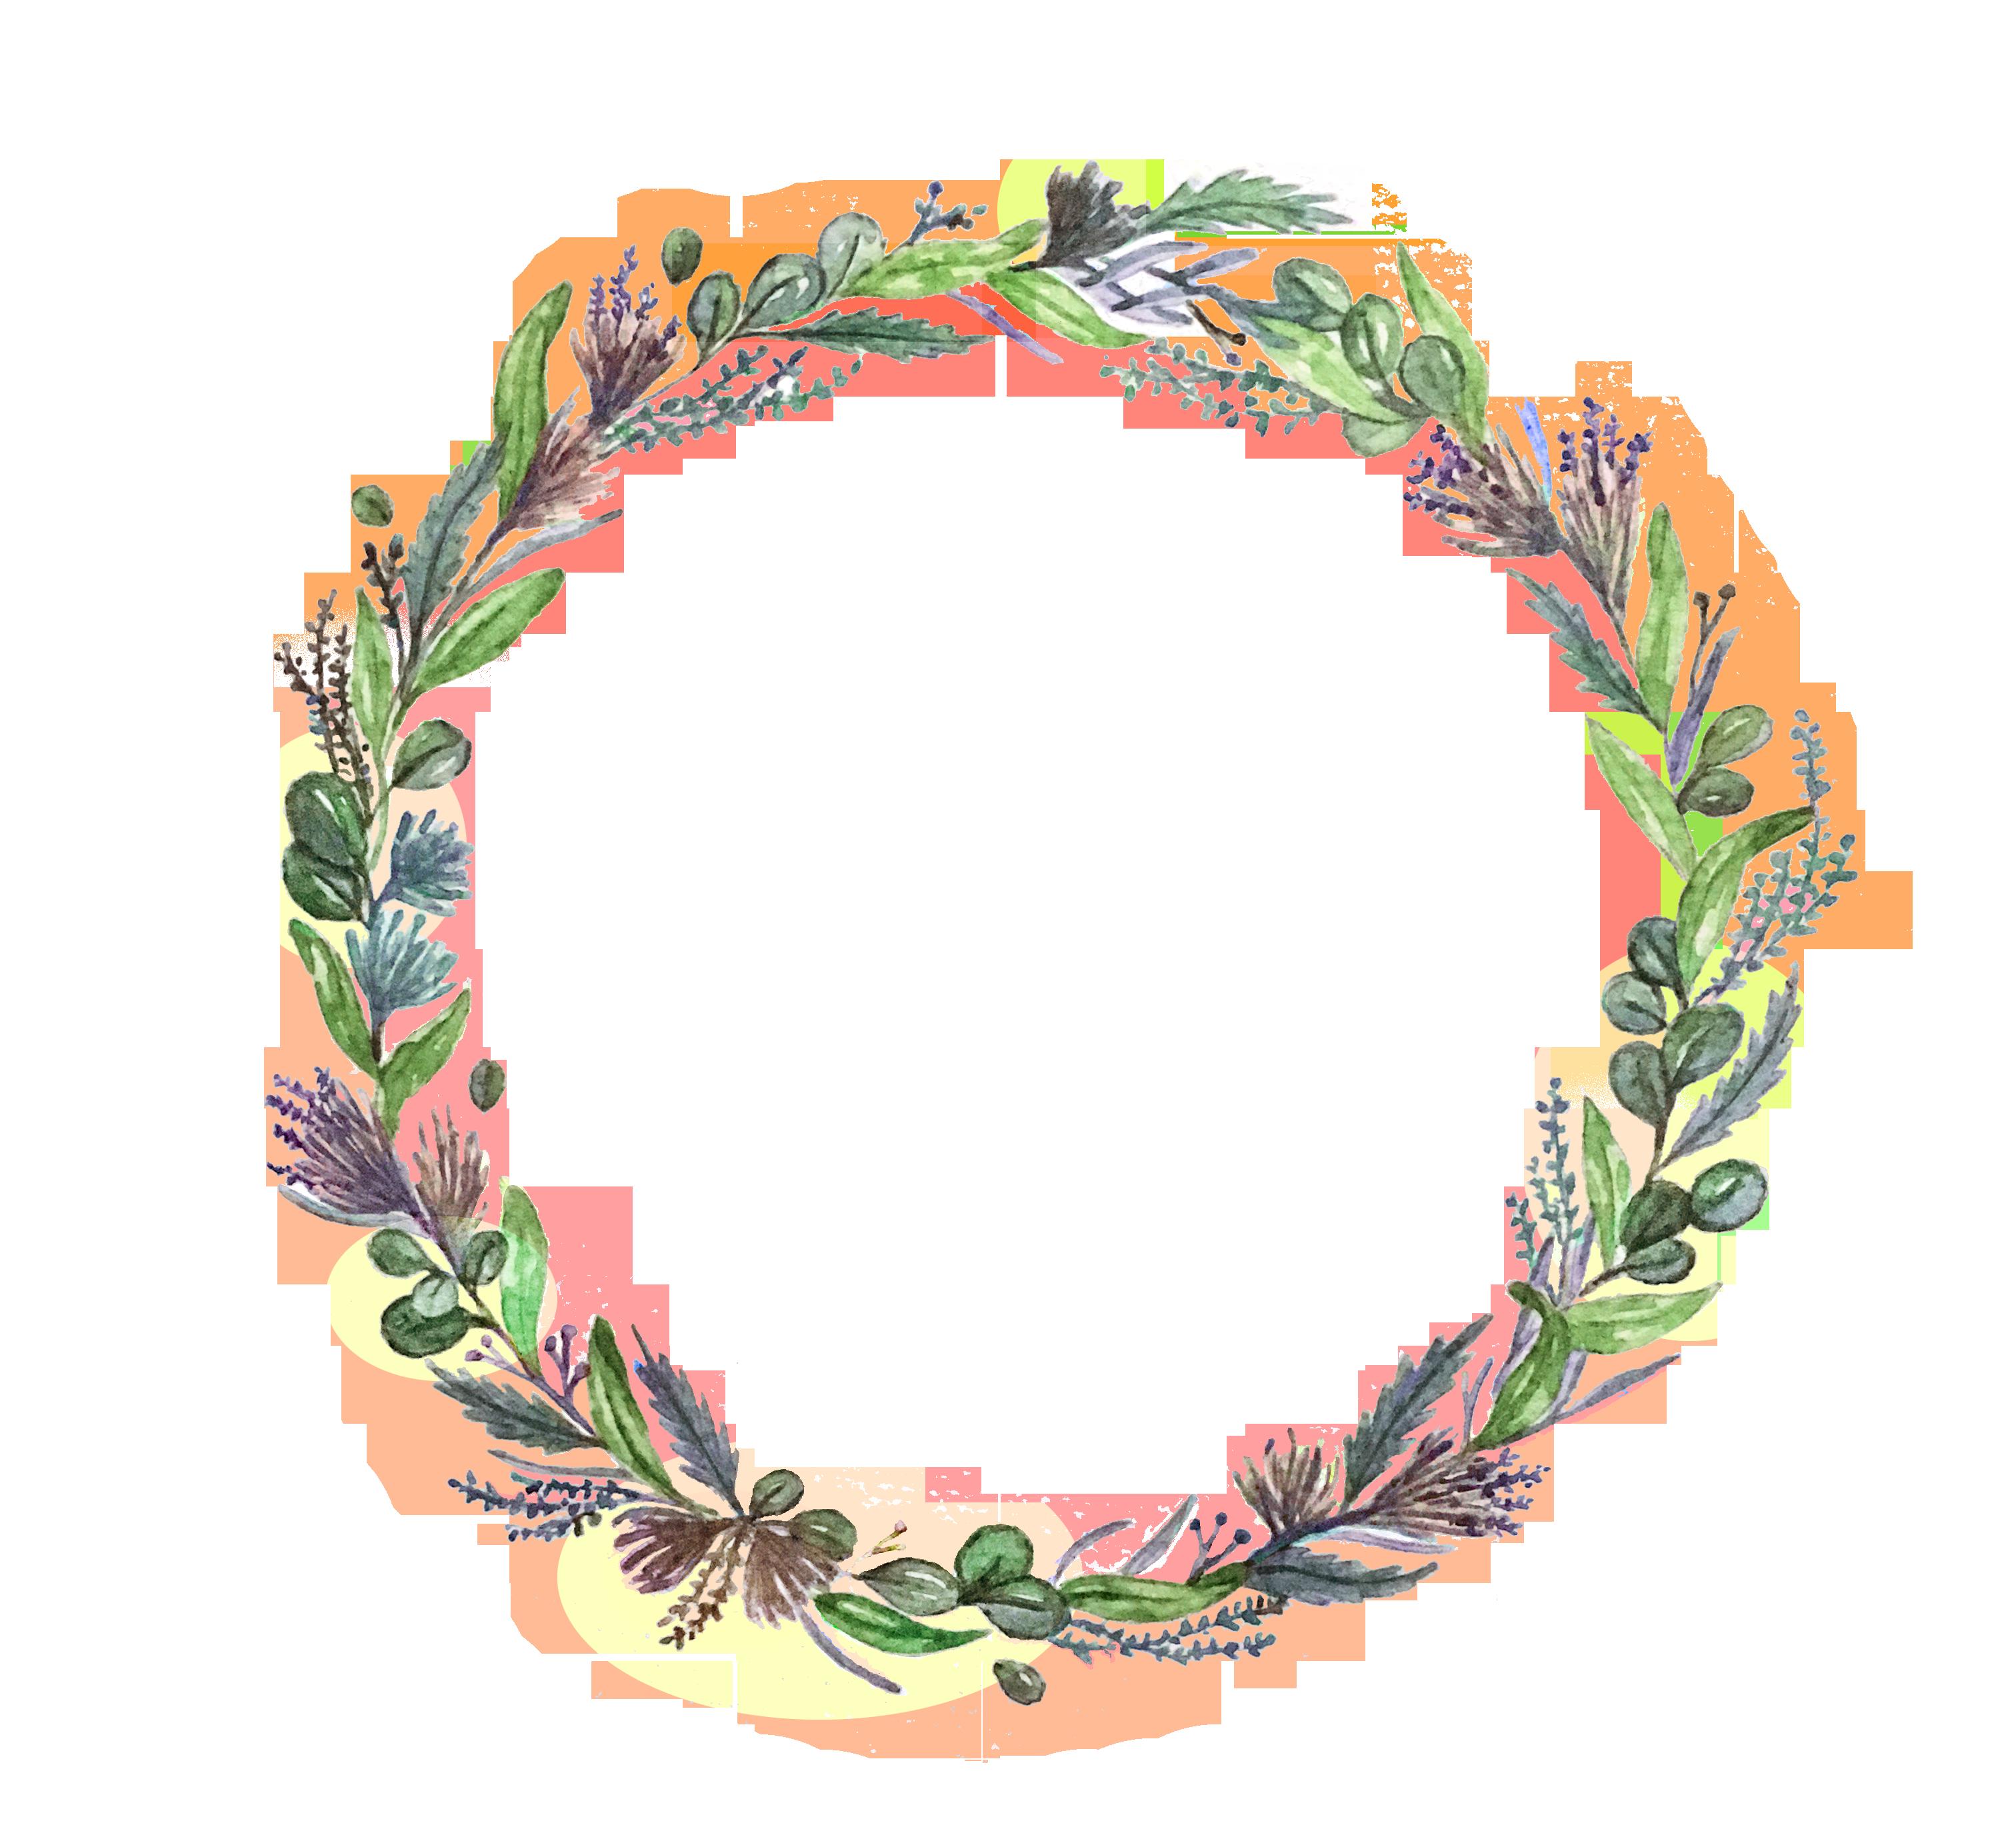 Wedding crown clipart invitation royalty free download Floral Illustration #illustration #wedding #floral   KAI'S WORKs ... royalty free download